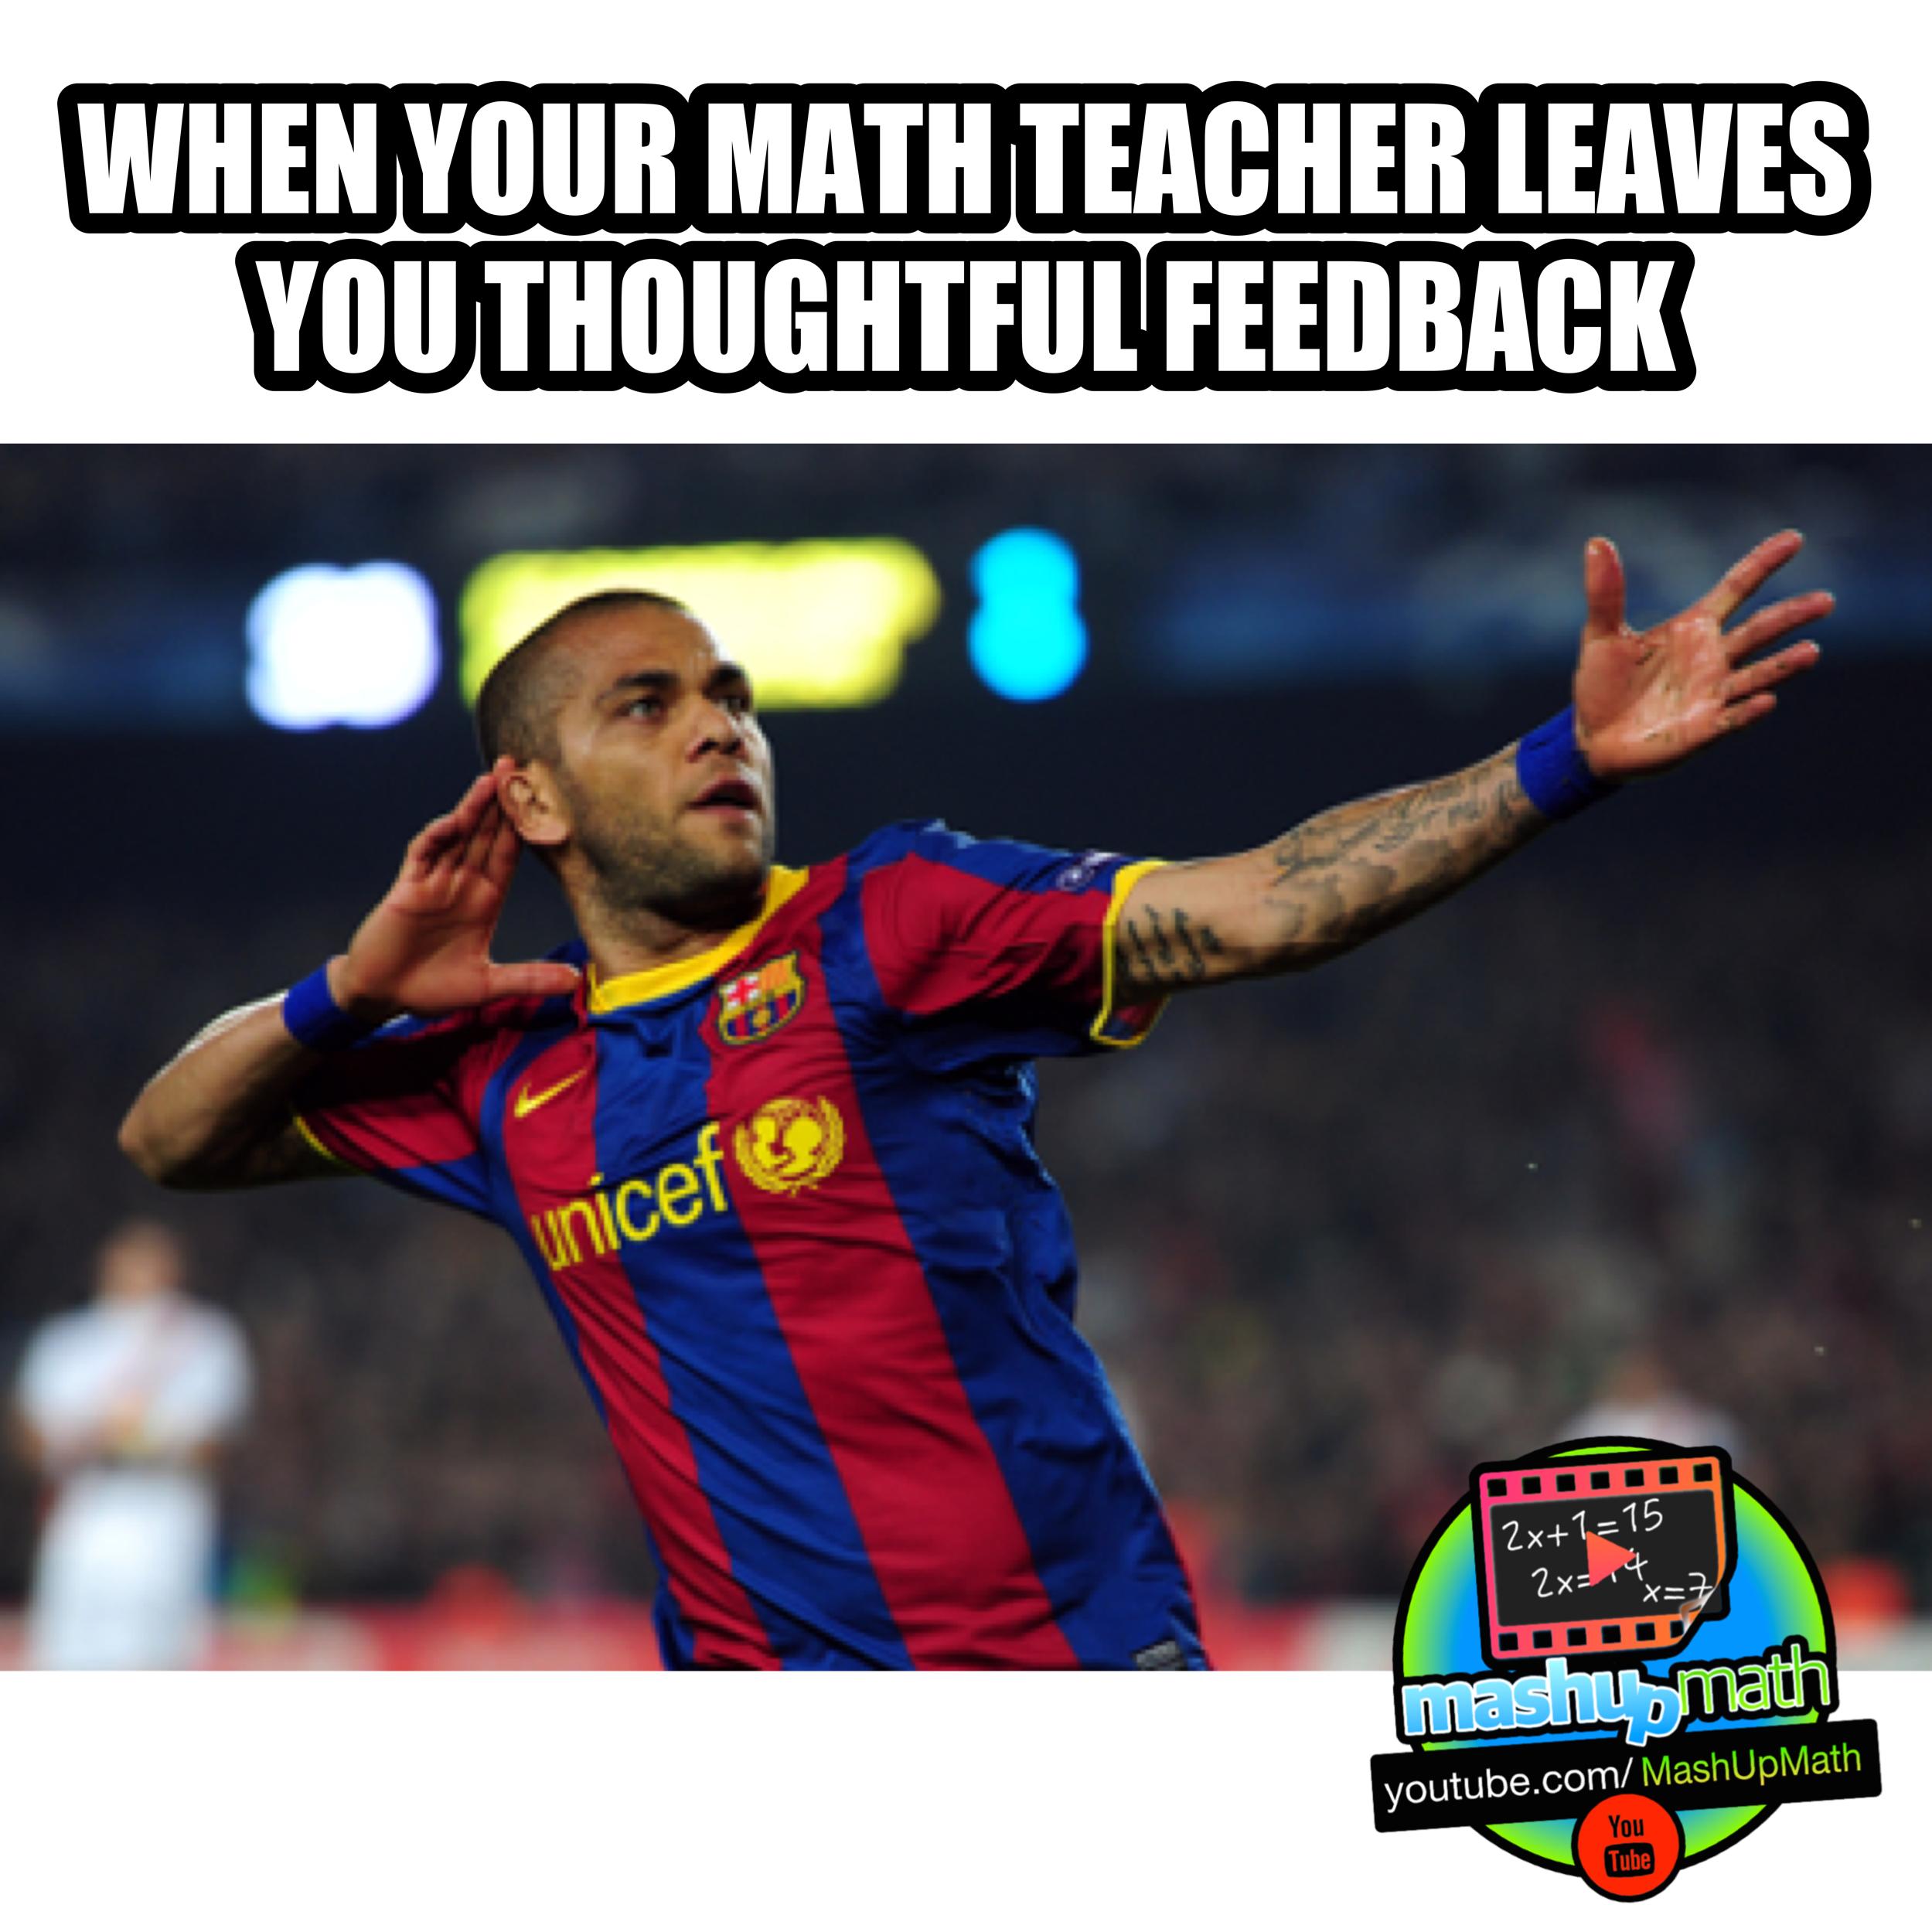 Love School Humor Follow Mashupmath On Instagram For